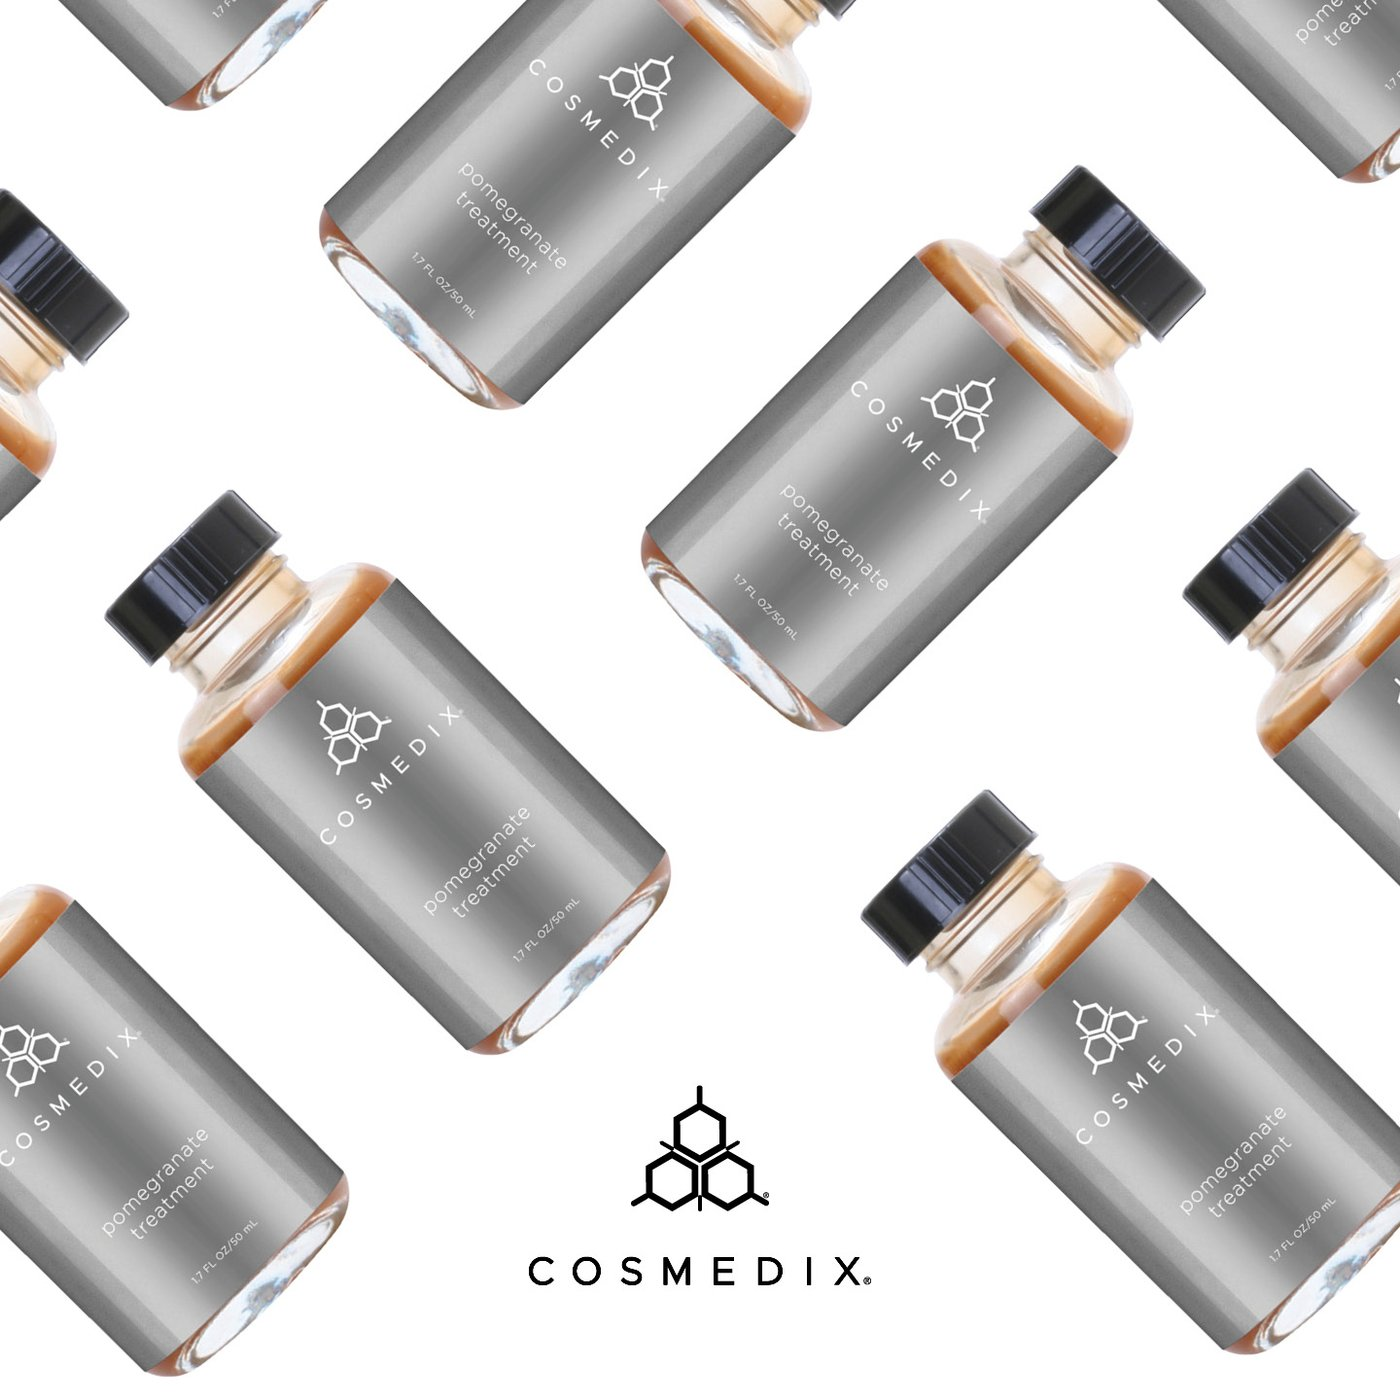 Cosmedix Professional Peels